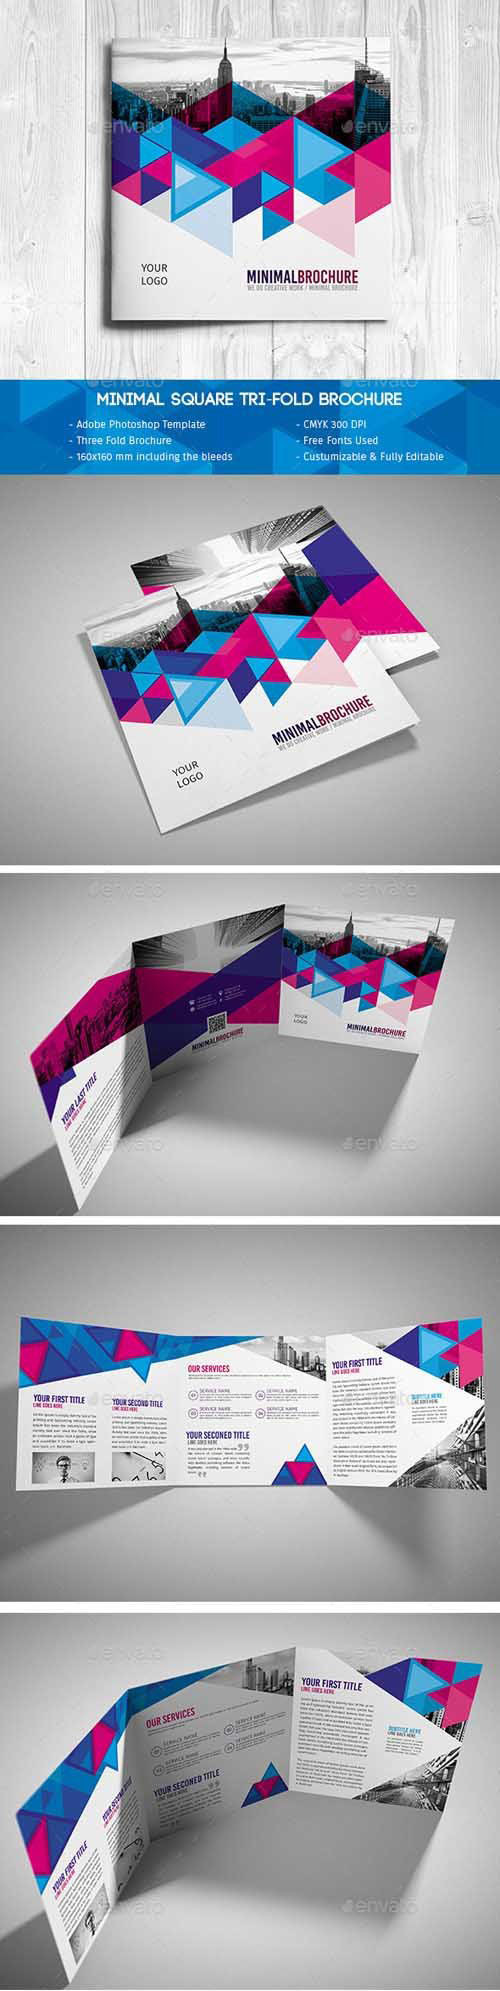 brochure design psd file - minimal square tri fold brochure psd template psd